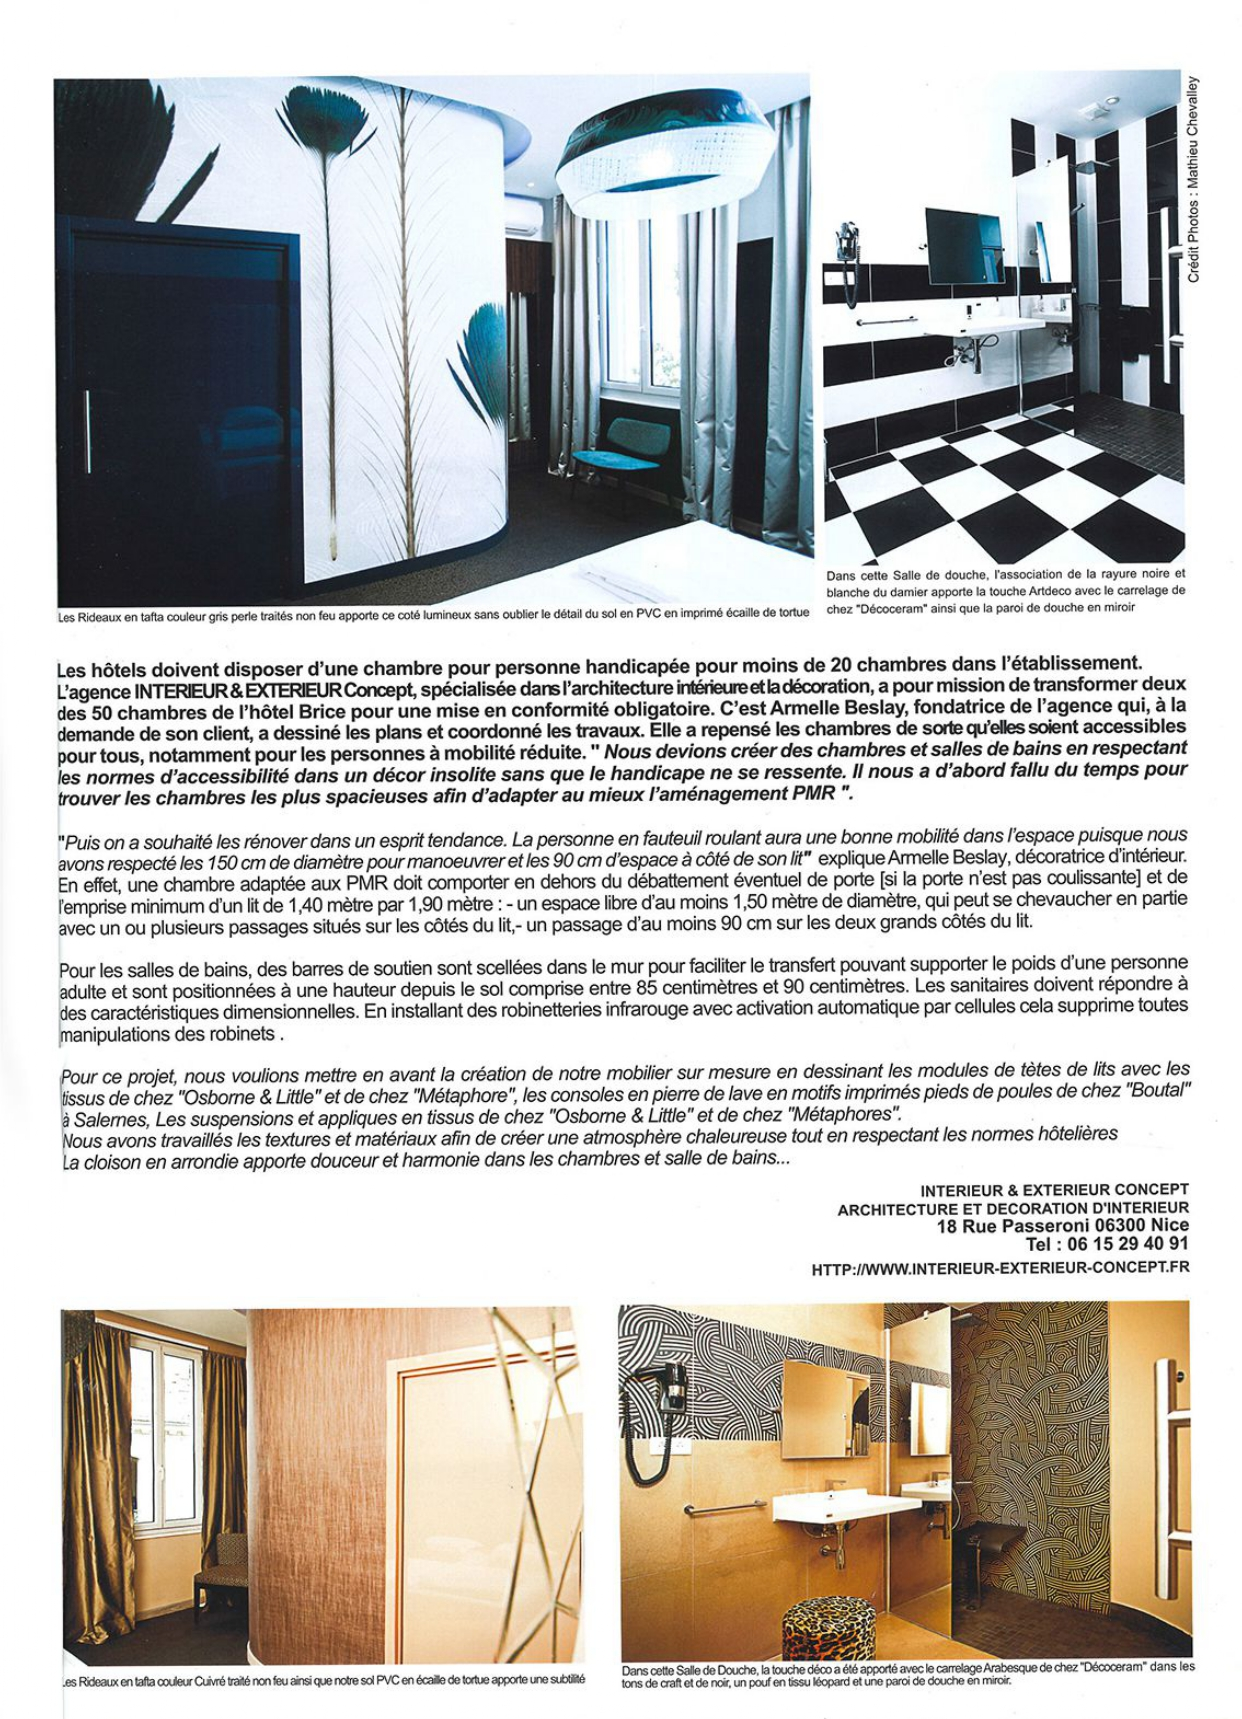 Perspective N°25 - Chambres adaptés aux PMR - Best Western Plus Hôtel Brice Garden Nice